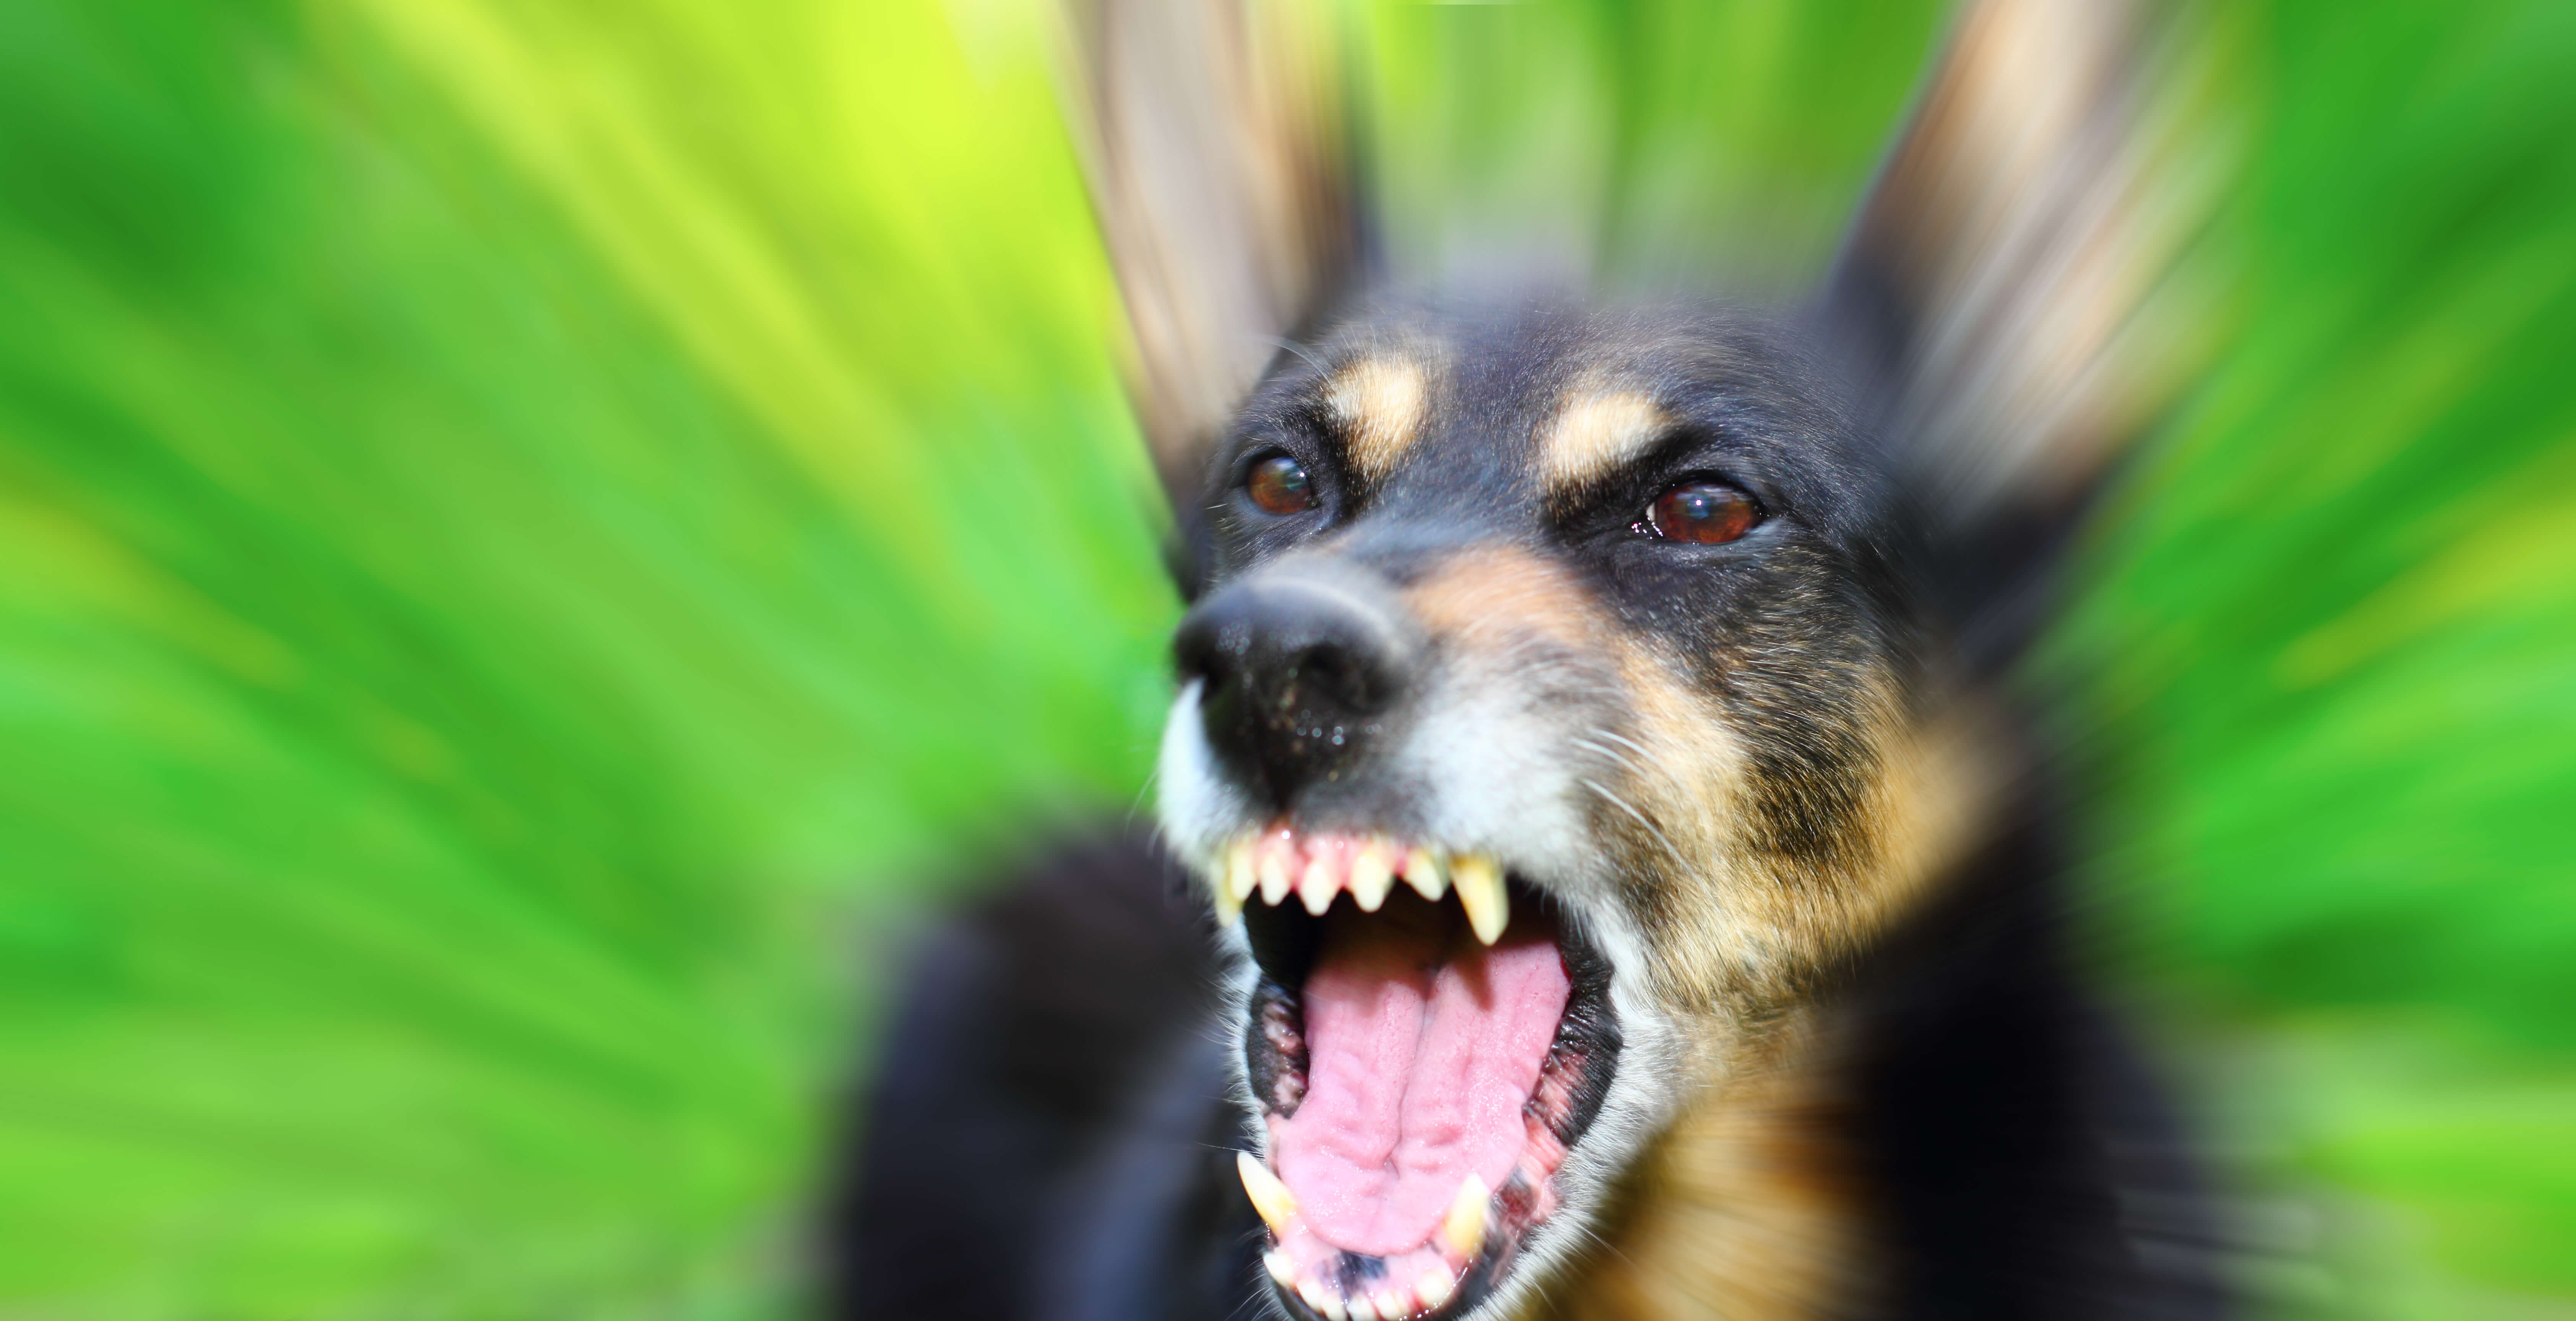 Barking enraged shepherd dog outdoors over blurred green background